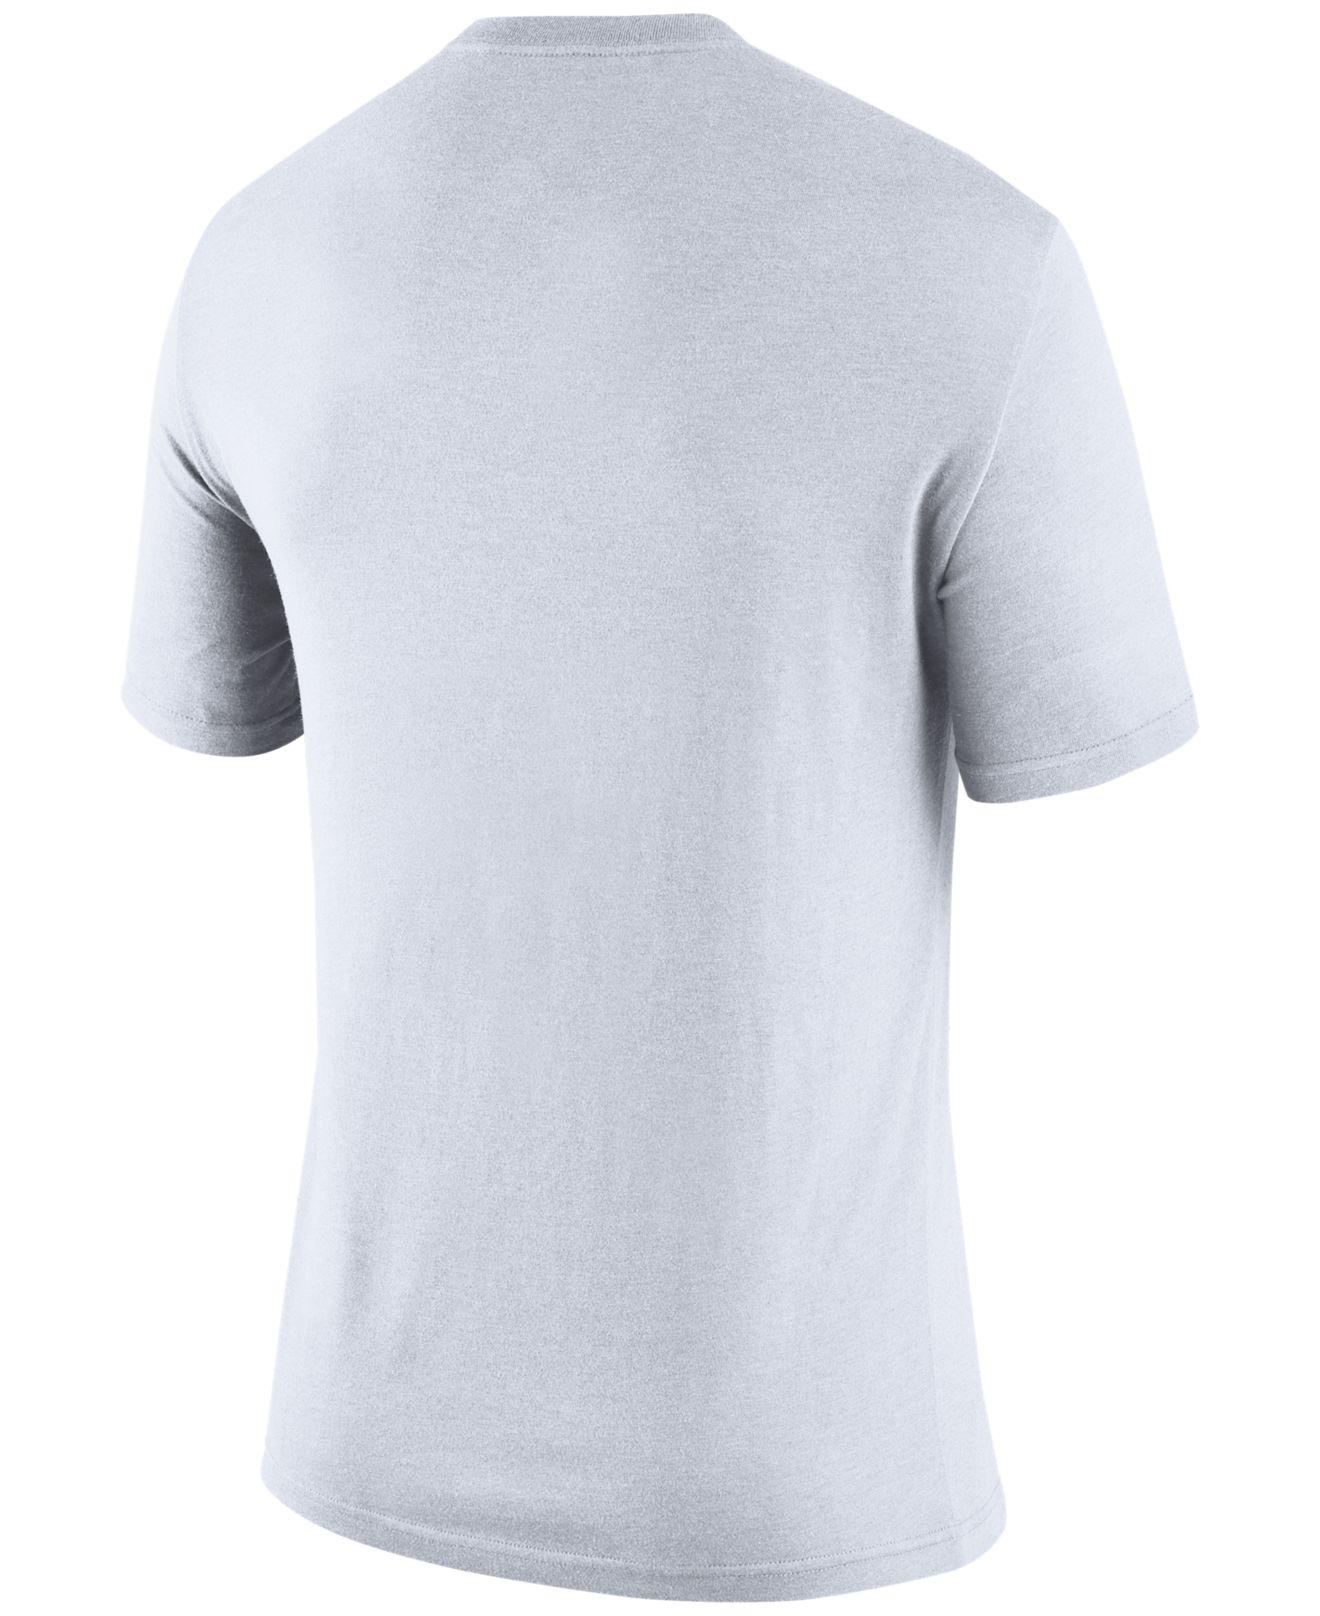 online retailer 3d27c ca325 White Men's Atlanta Falcons Helmet T-shirt